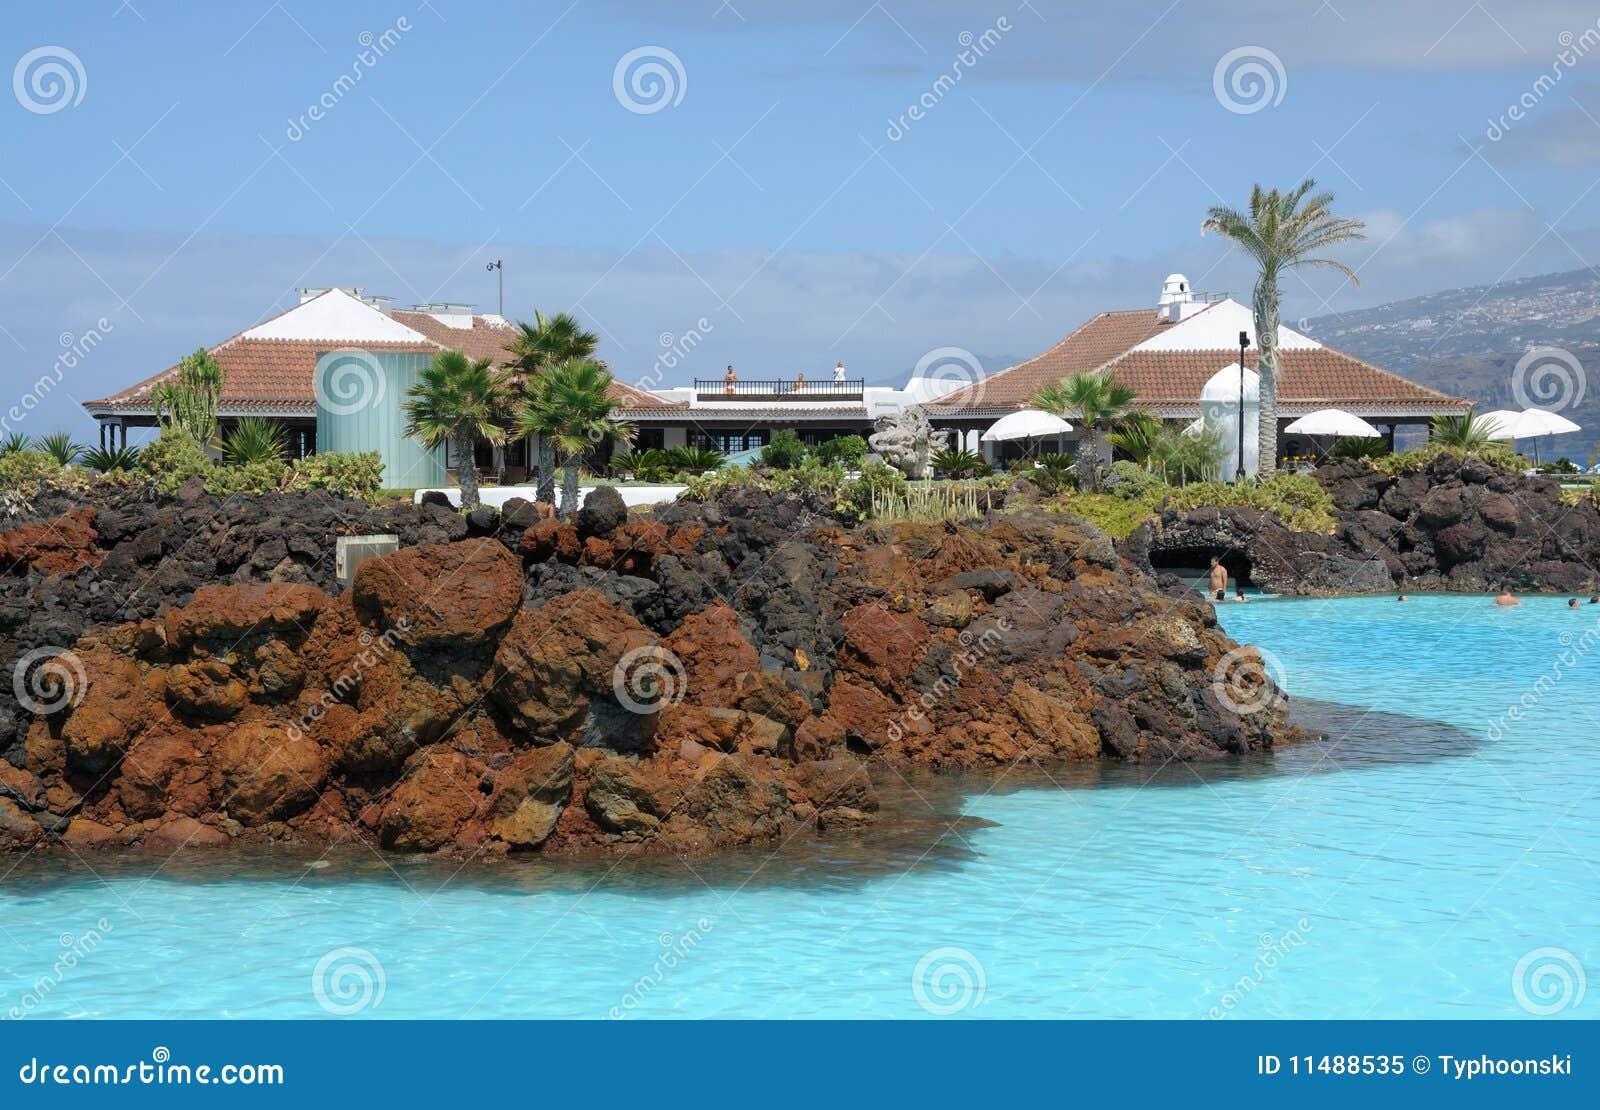 Sea-water pool complex, Tenerife